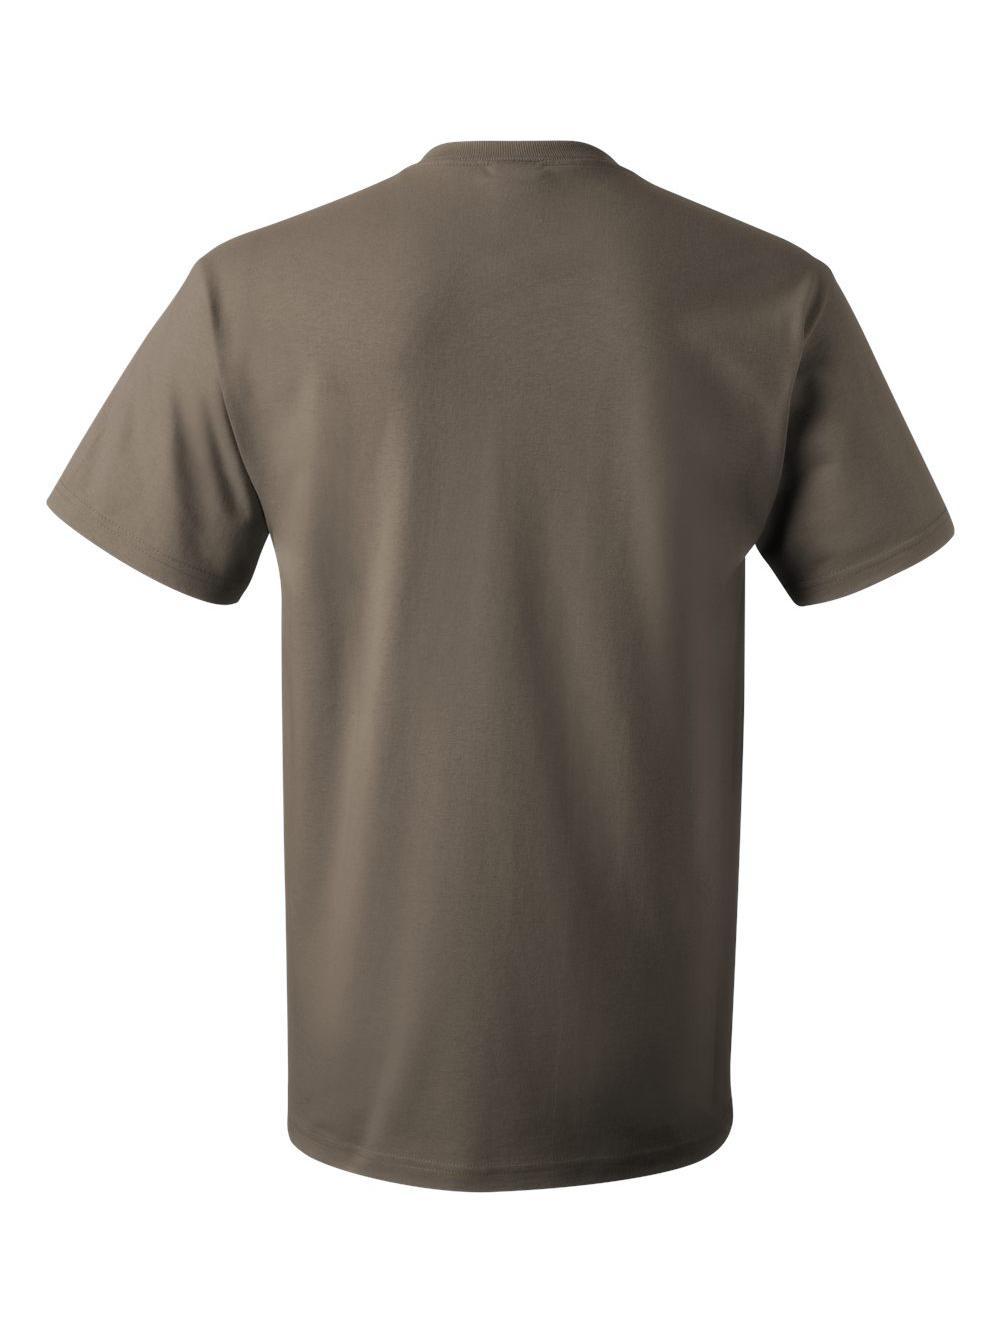 Fruit-of-the-Loom-HD-Cotton-Short-Sleeve-T-Shirt-3930R thumbnail 115